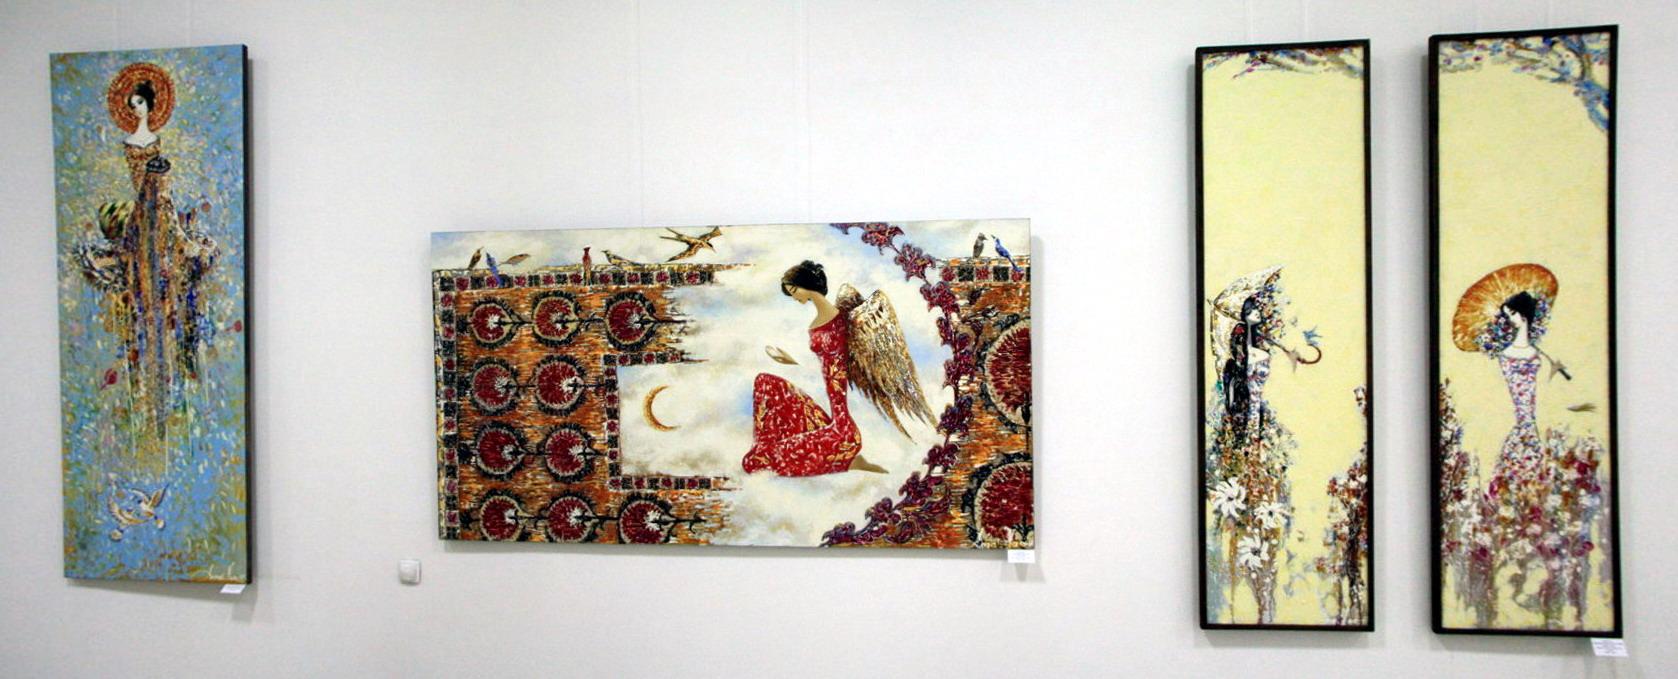 Акмаль Нуриддинов. (Нур). Экспозиция картин.